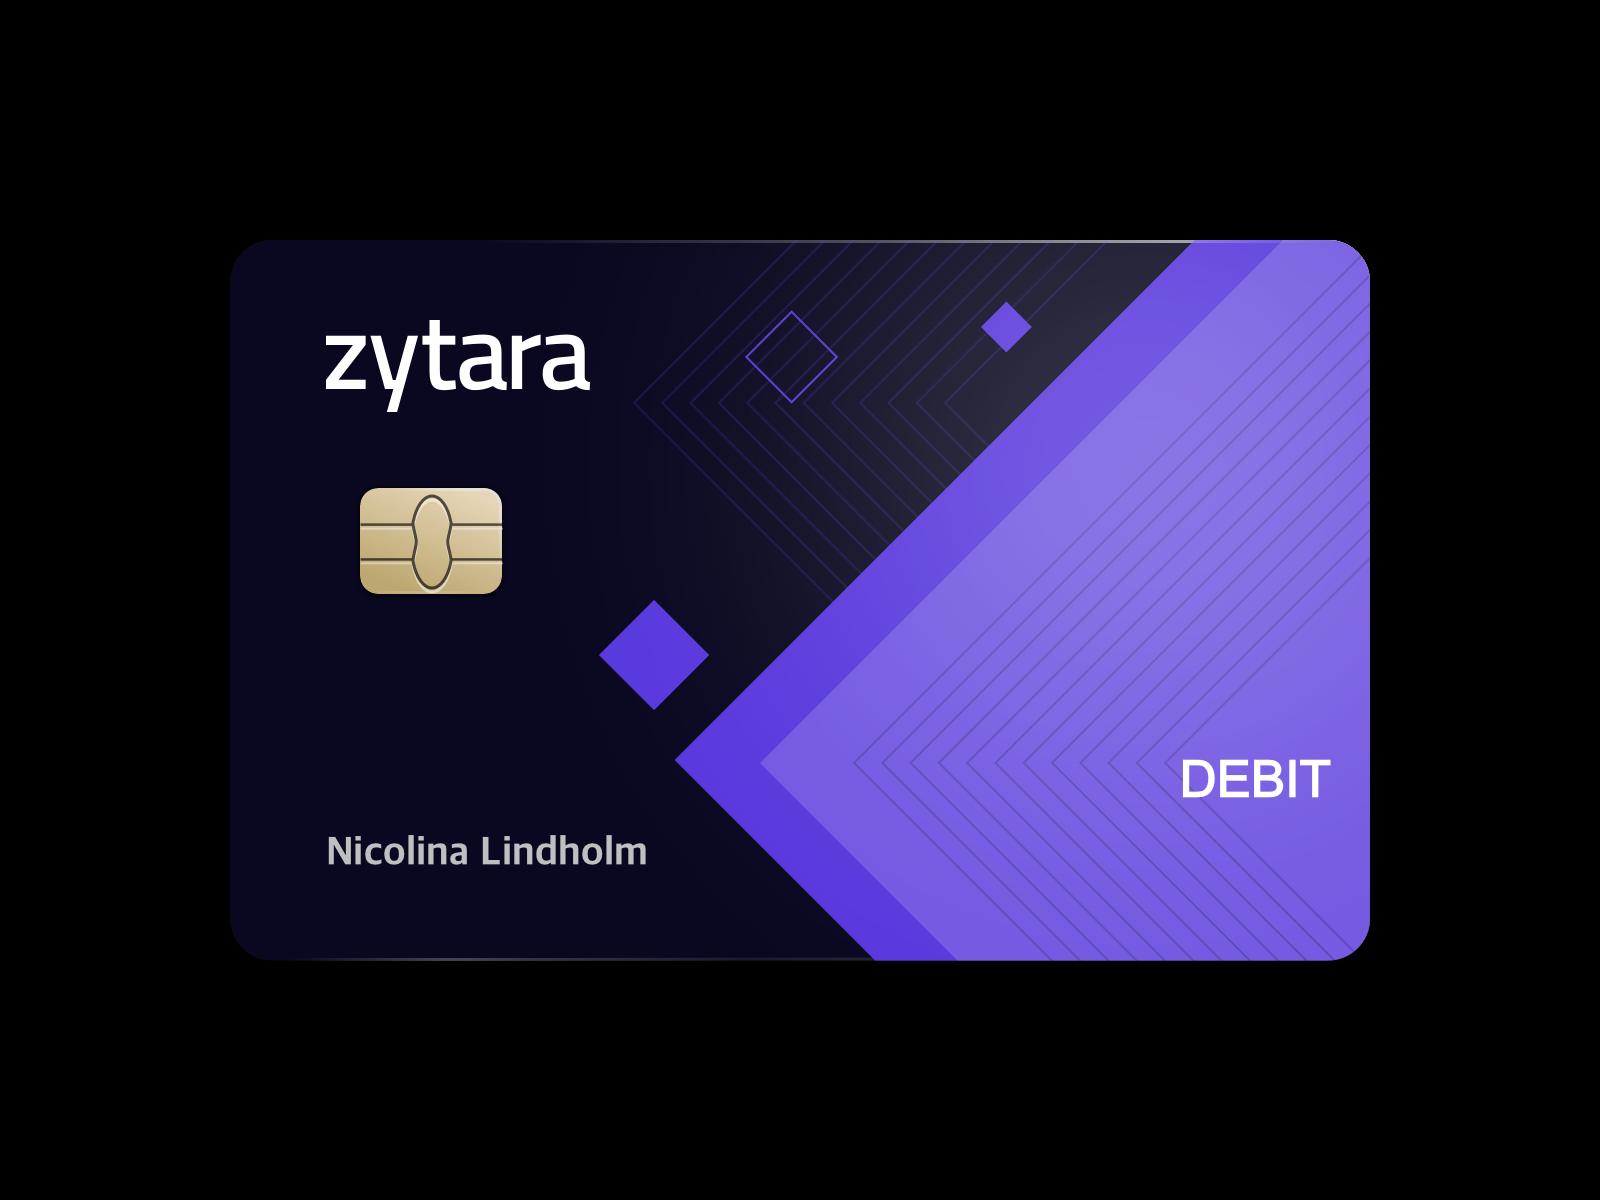 Zytara debit card - i2c partners with Zytara-world's first digital bank for millennials, Gen Z gamers